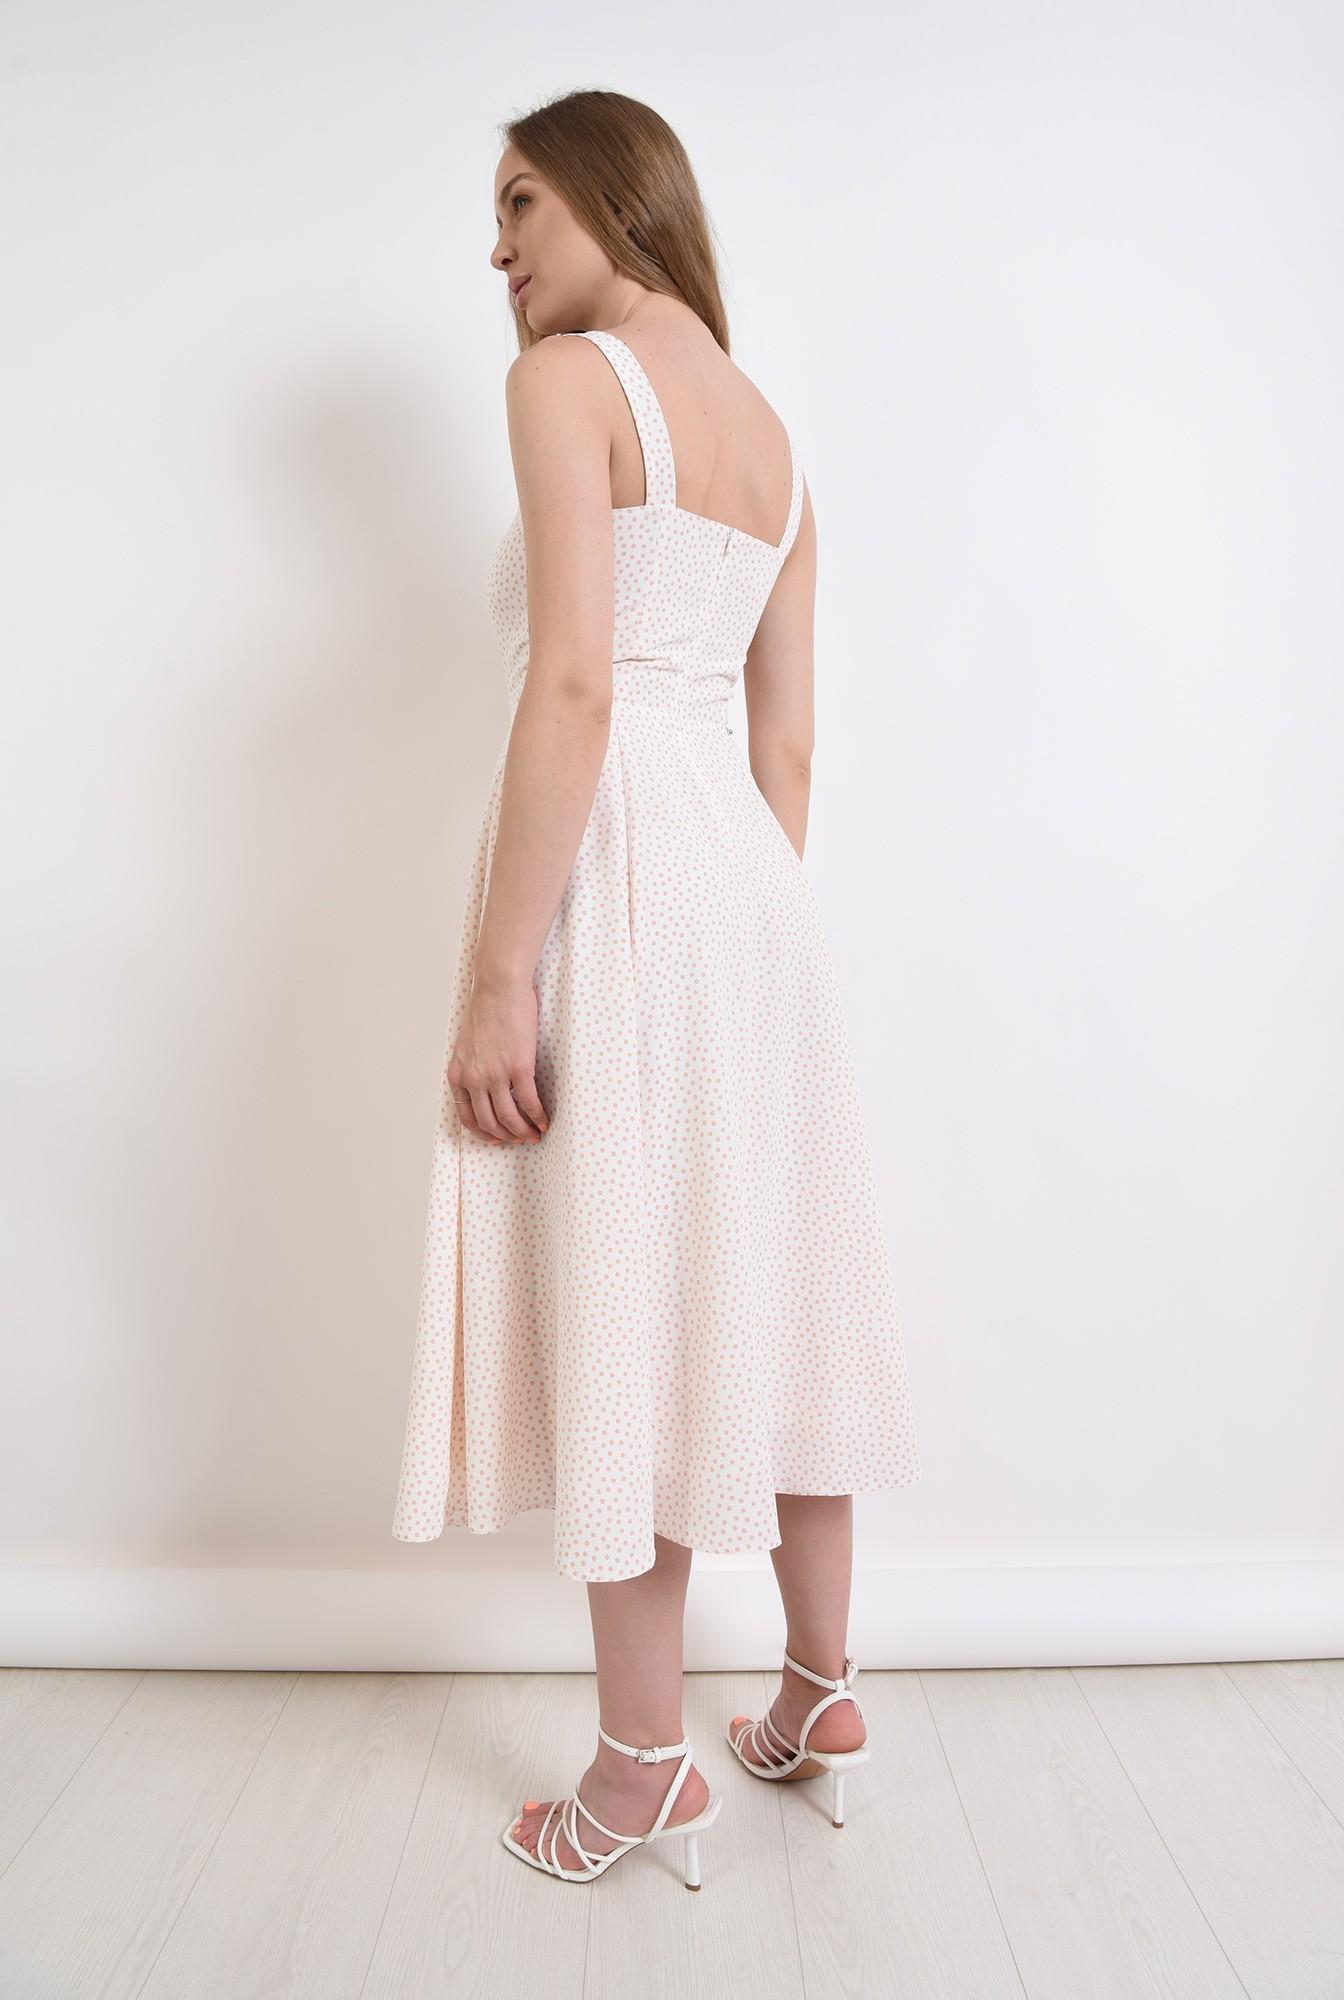 1 - rochie de vara, cu buline, evazata